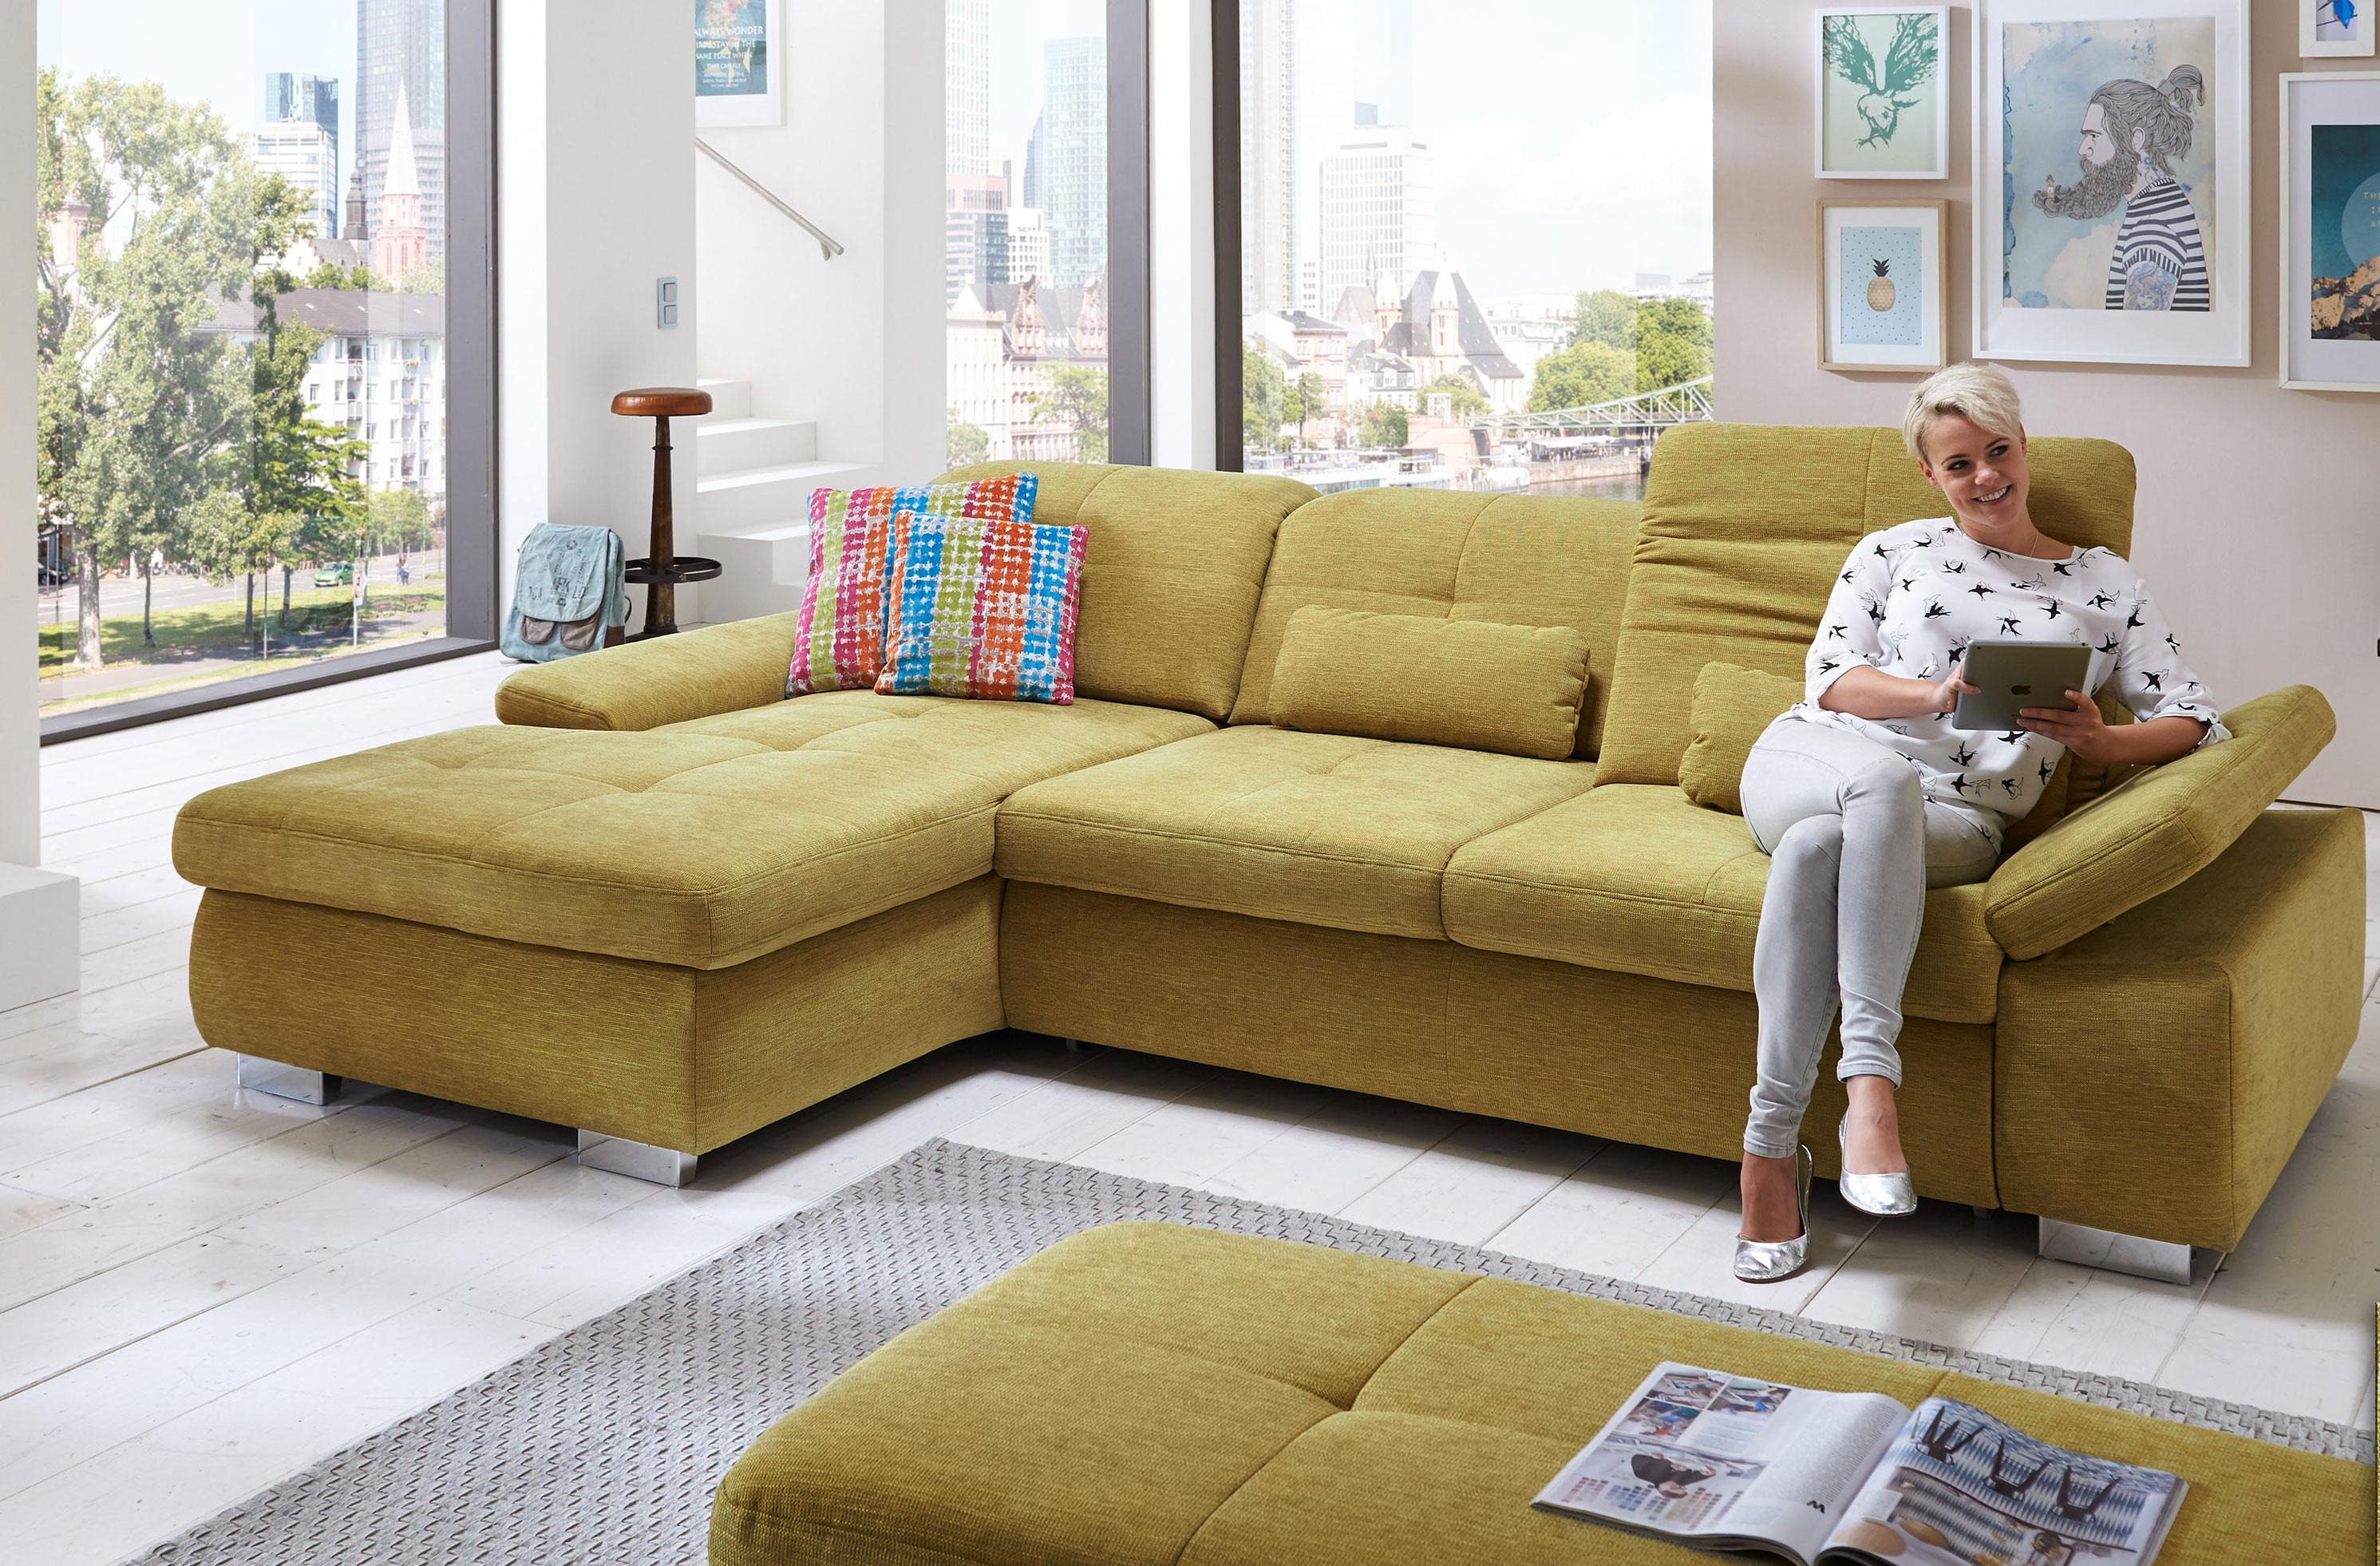 megapol artus schlafsofa mit recamiere m belmeile24. Black Bedroom Furniture Sets. Home Design Ideas